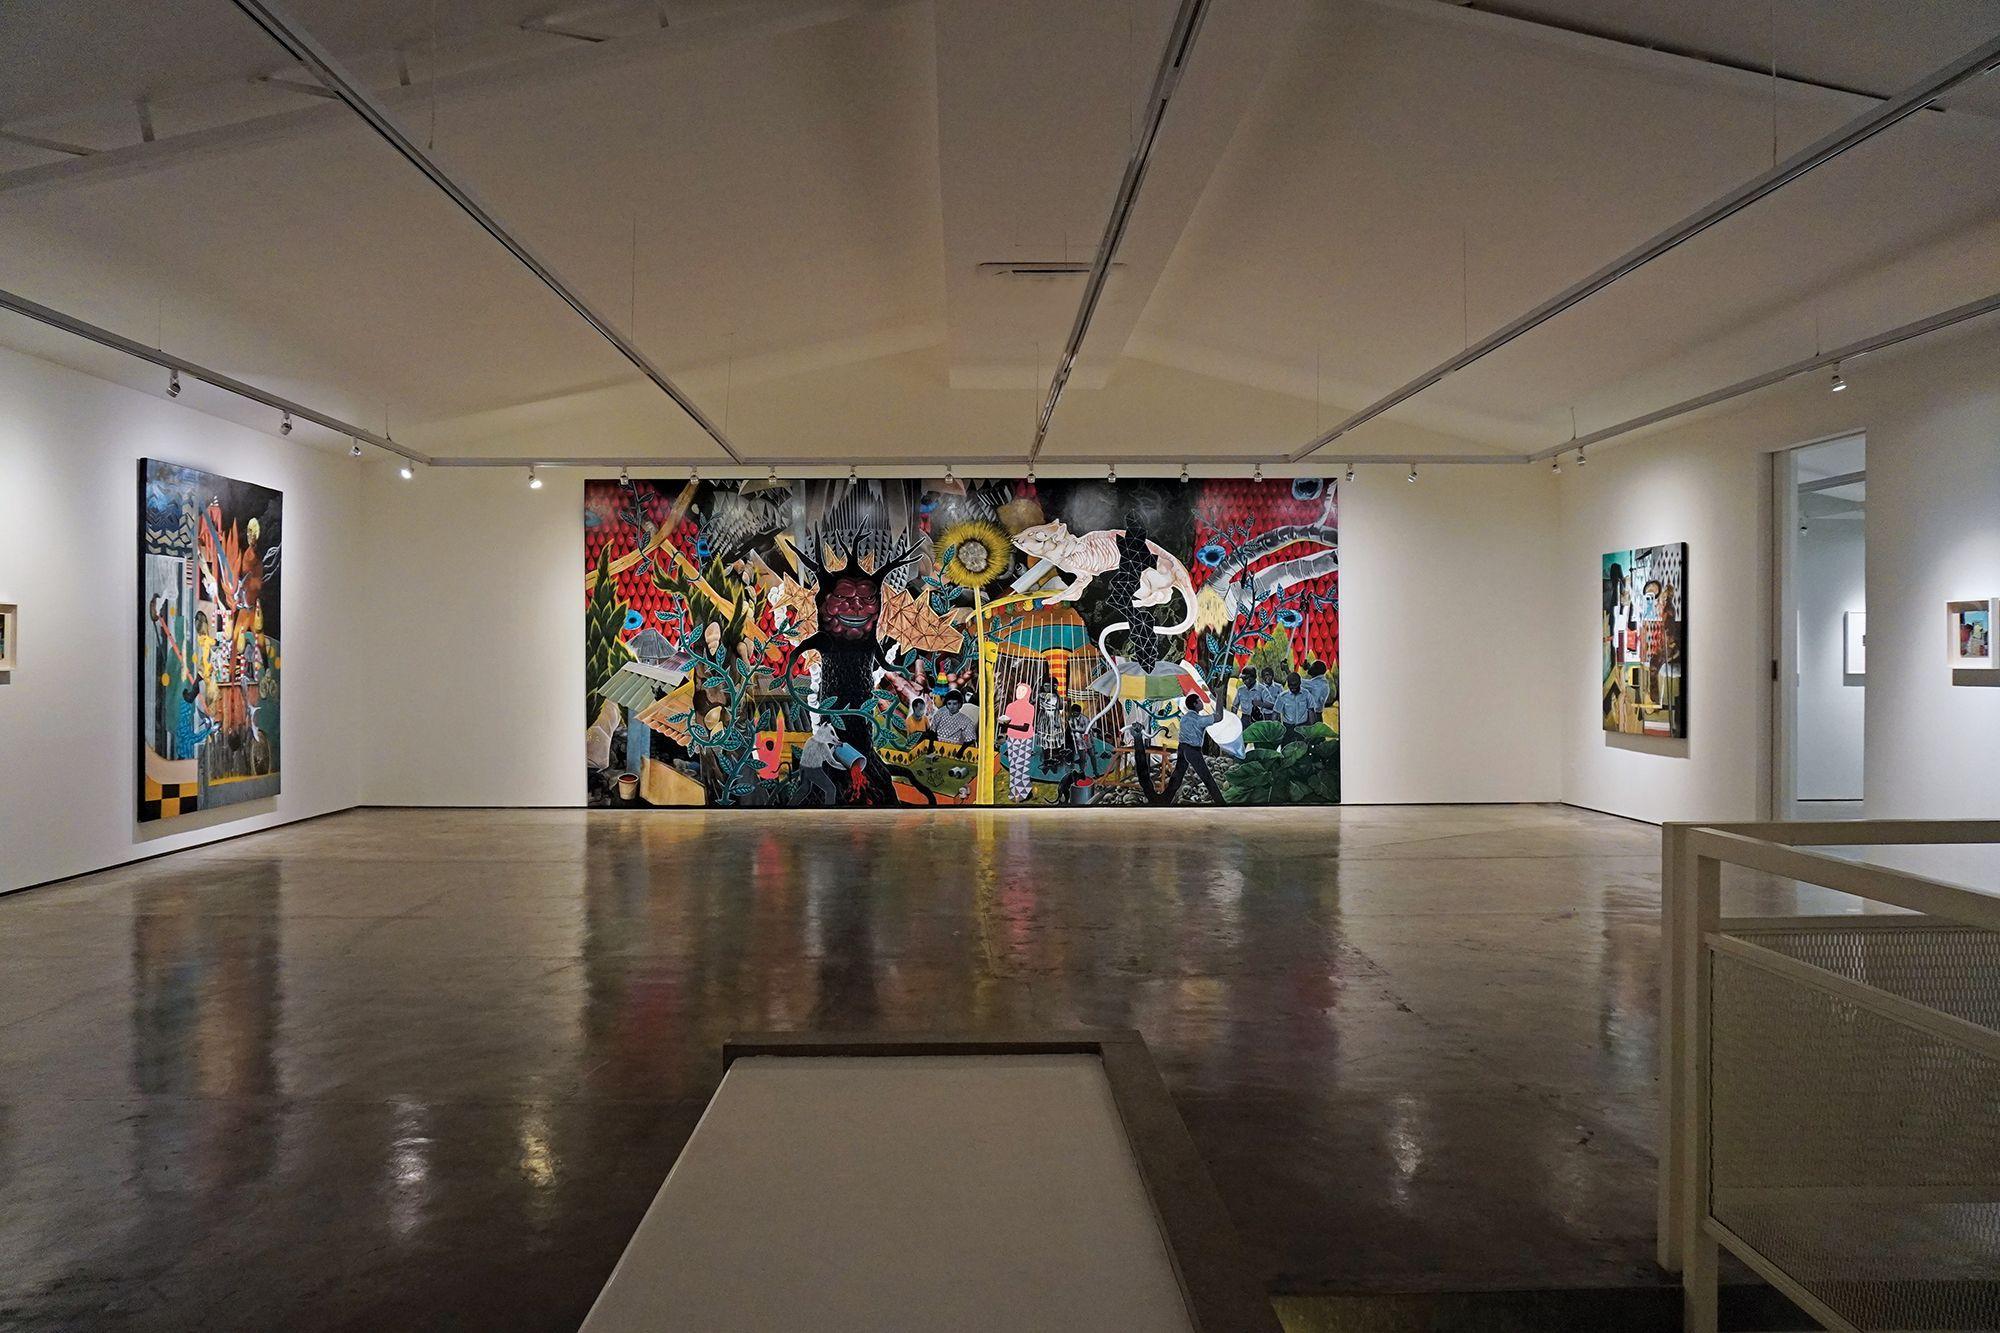 10 Must-See Contemporary Art Galleries In Metro Manila